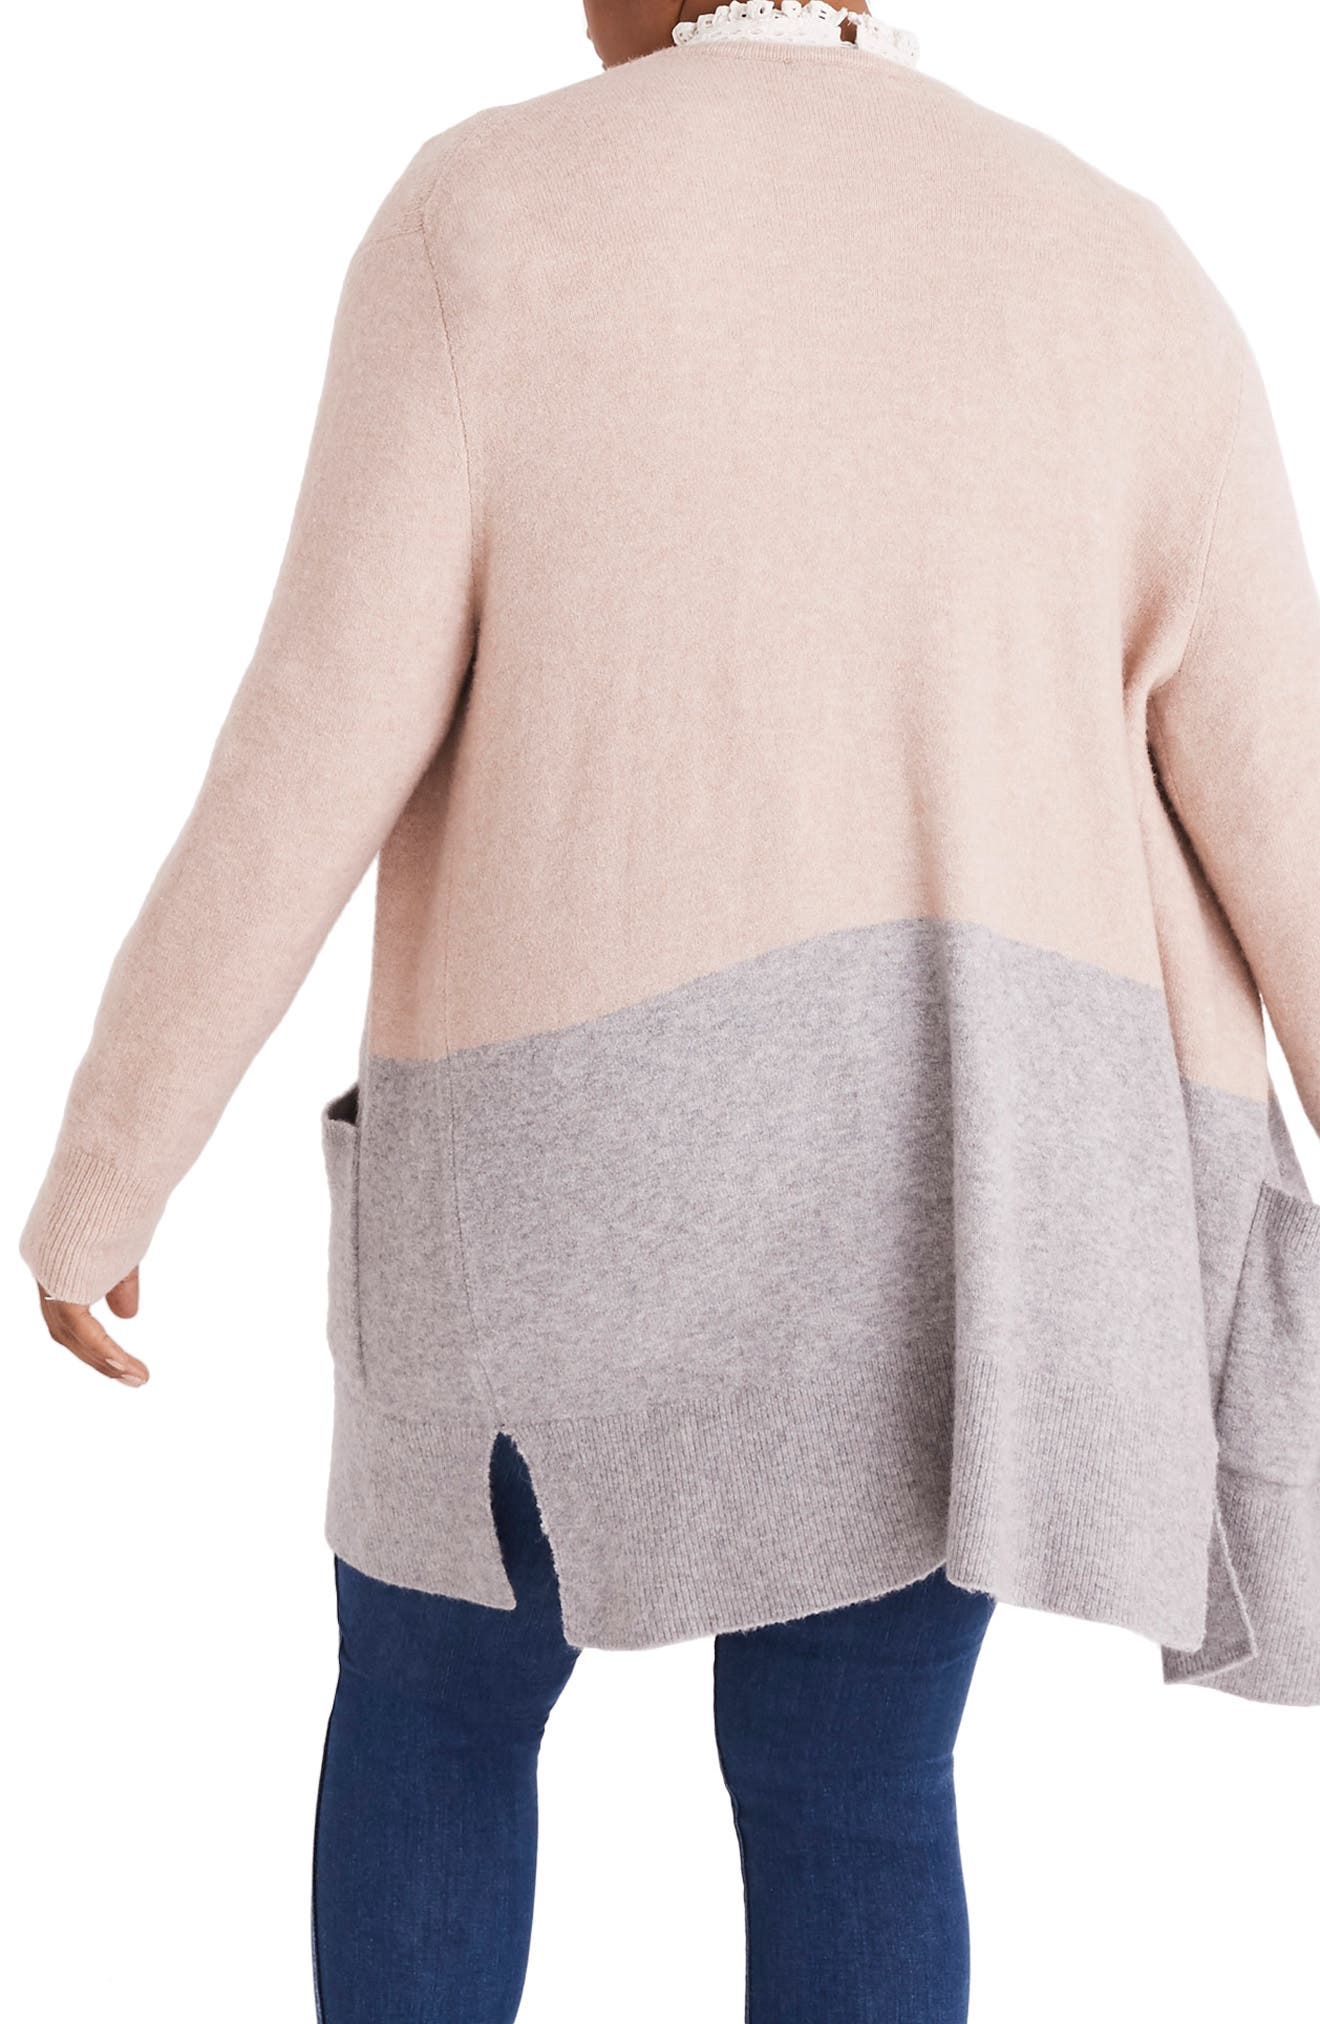 Kent Colorblock Cardigan Sweater,                             Alternate thumbnail 6, color,                             HEATHER BEIGE